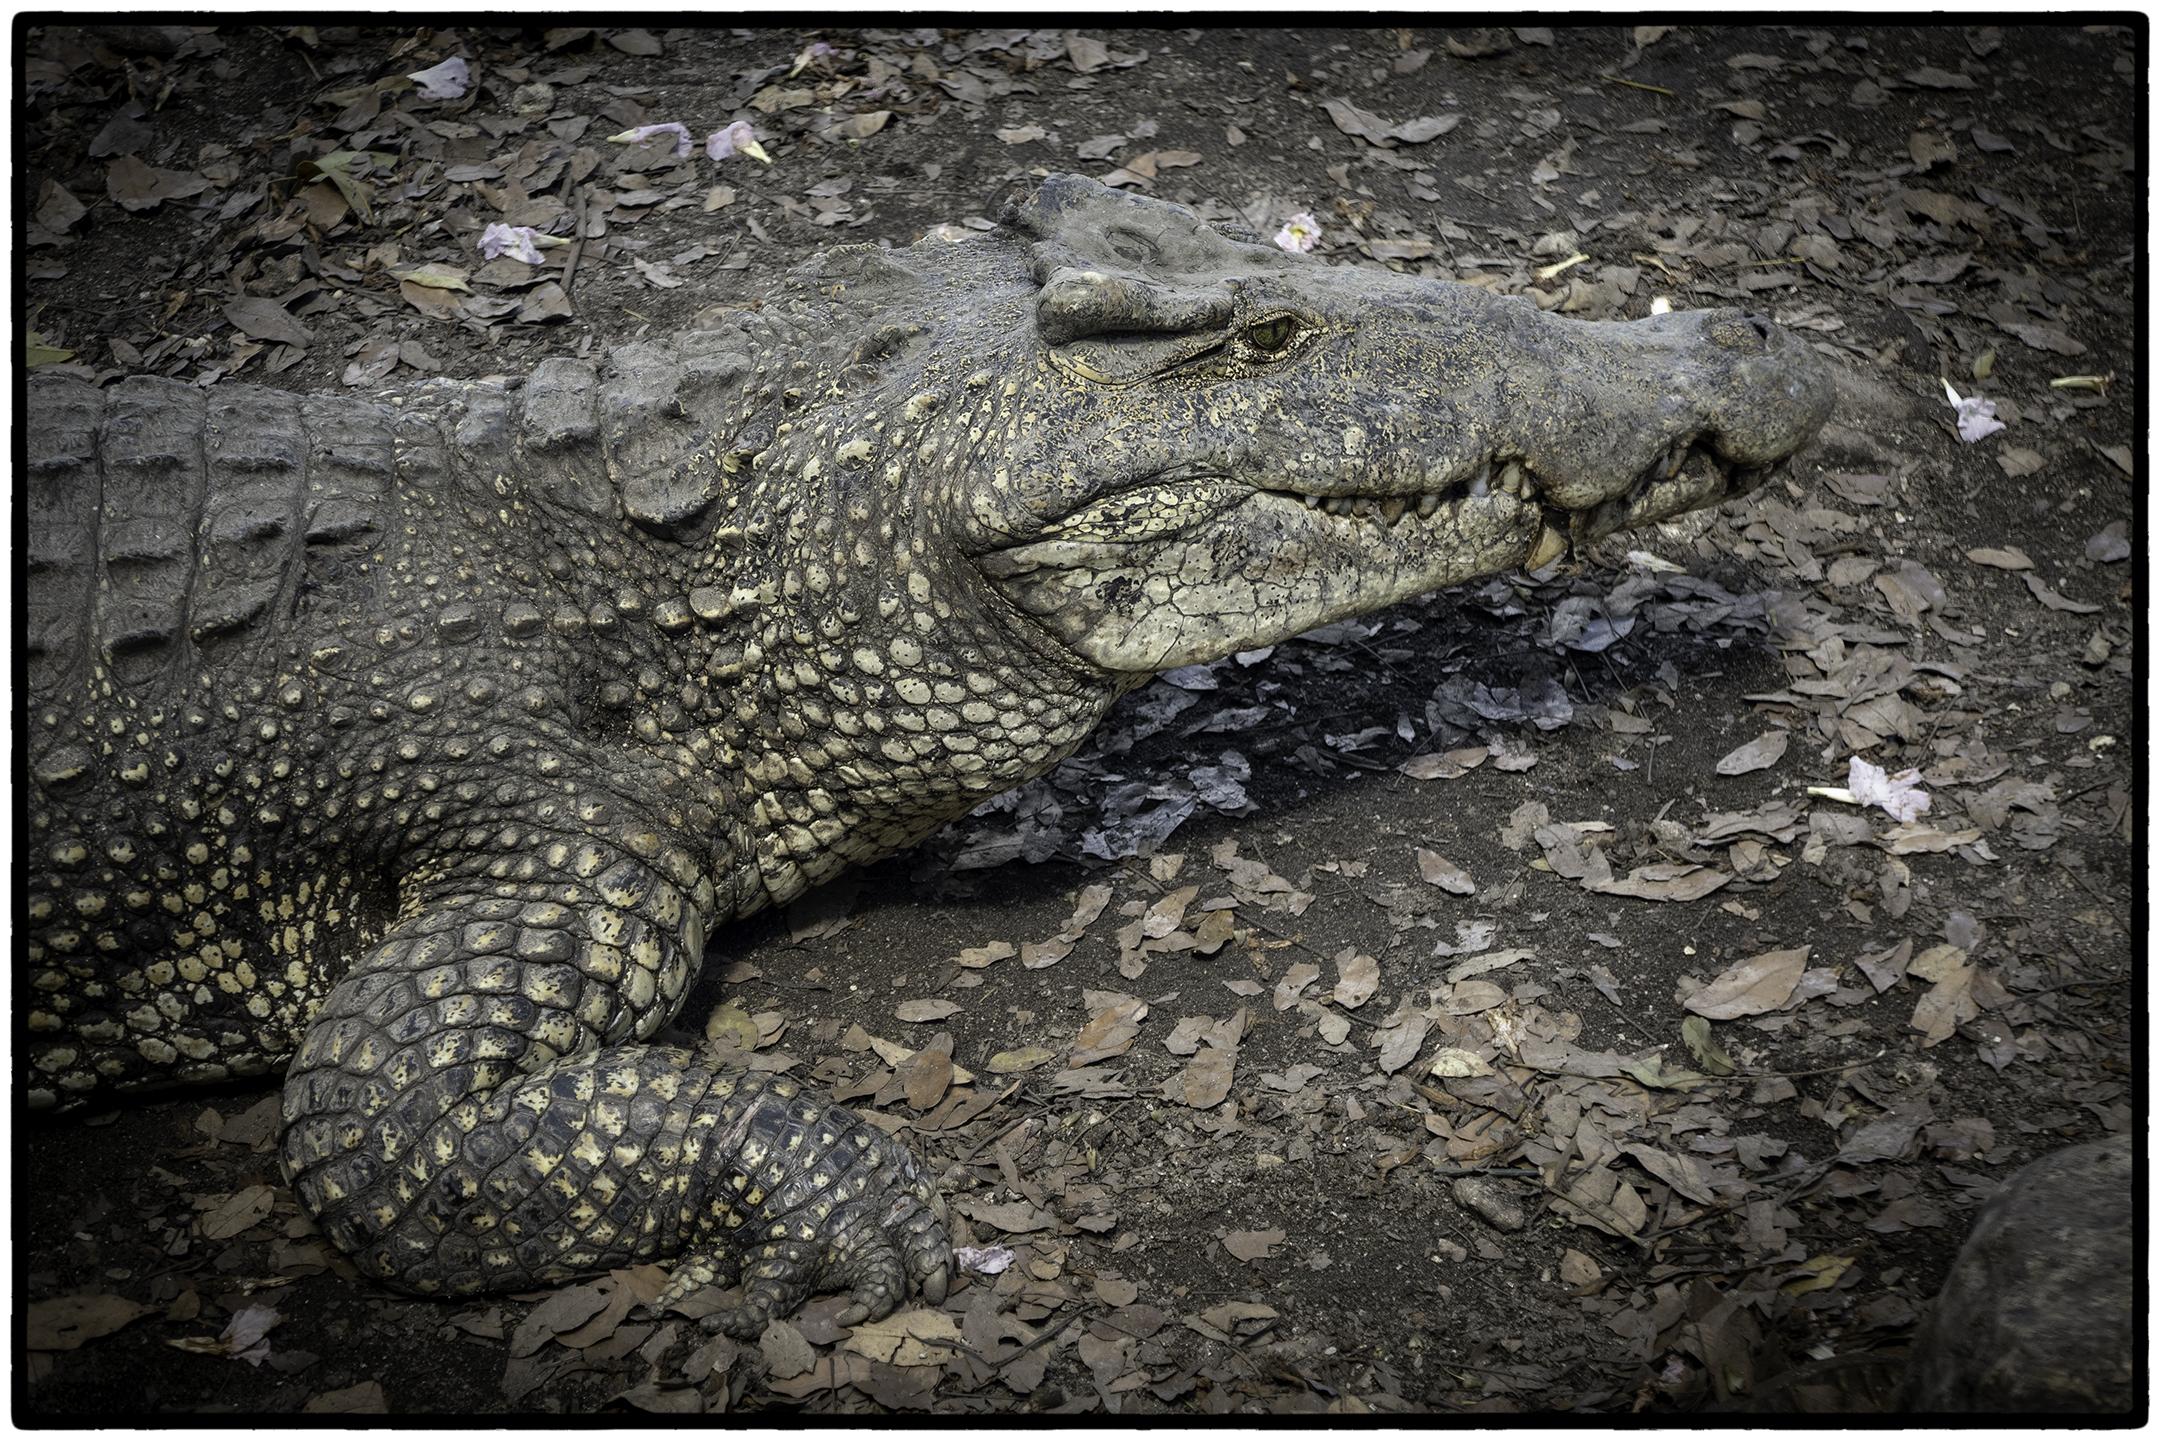 Adult crocodile, Matanzas, Cuba